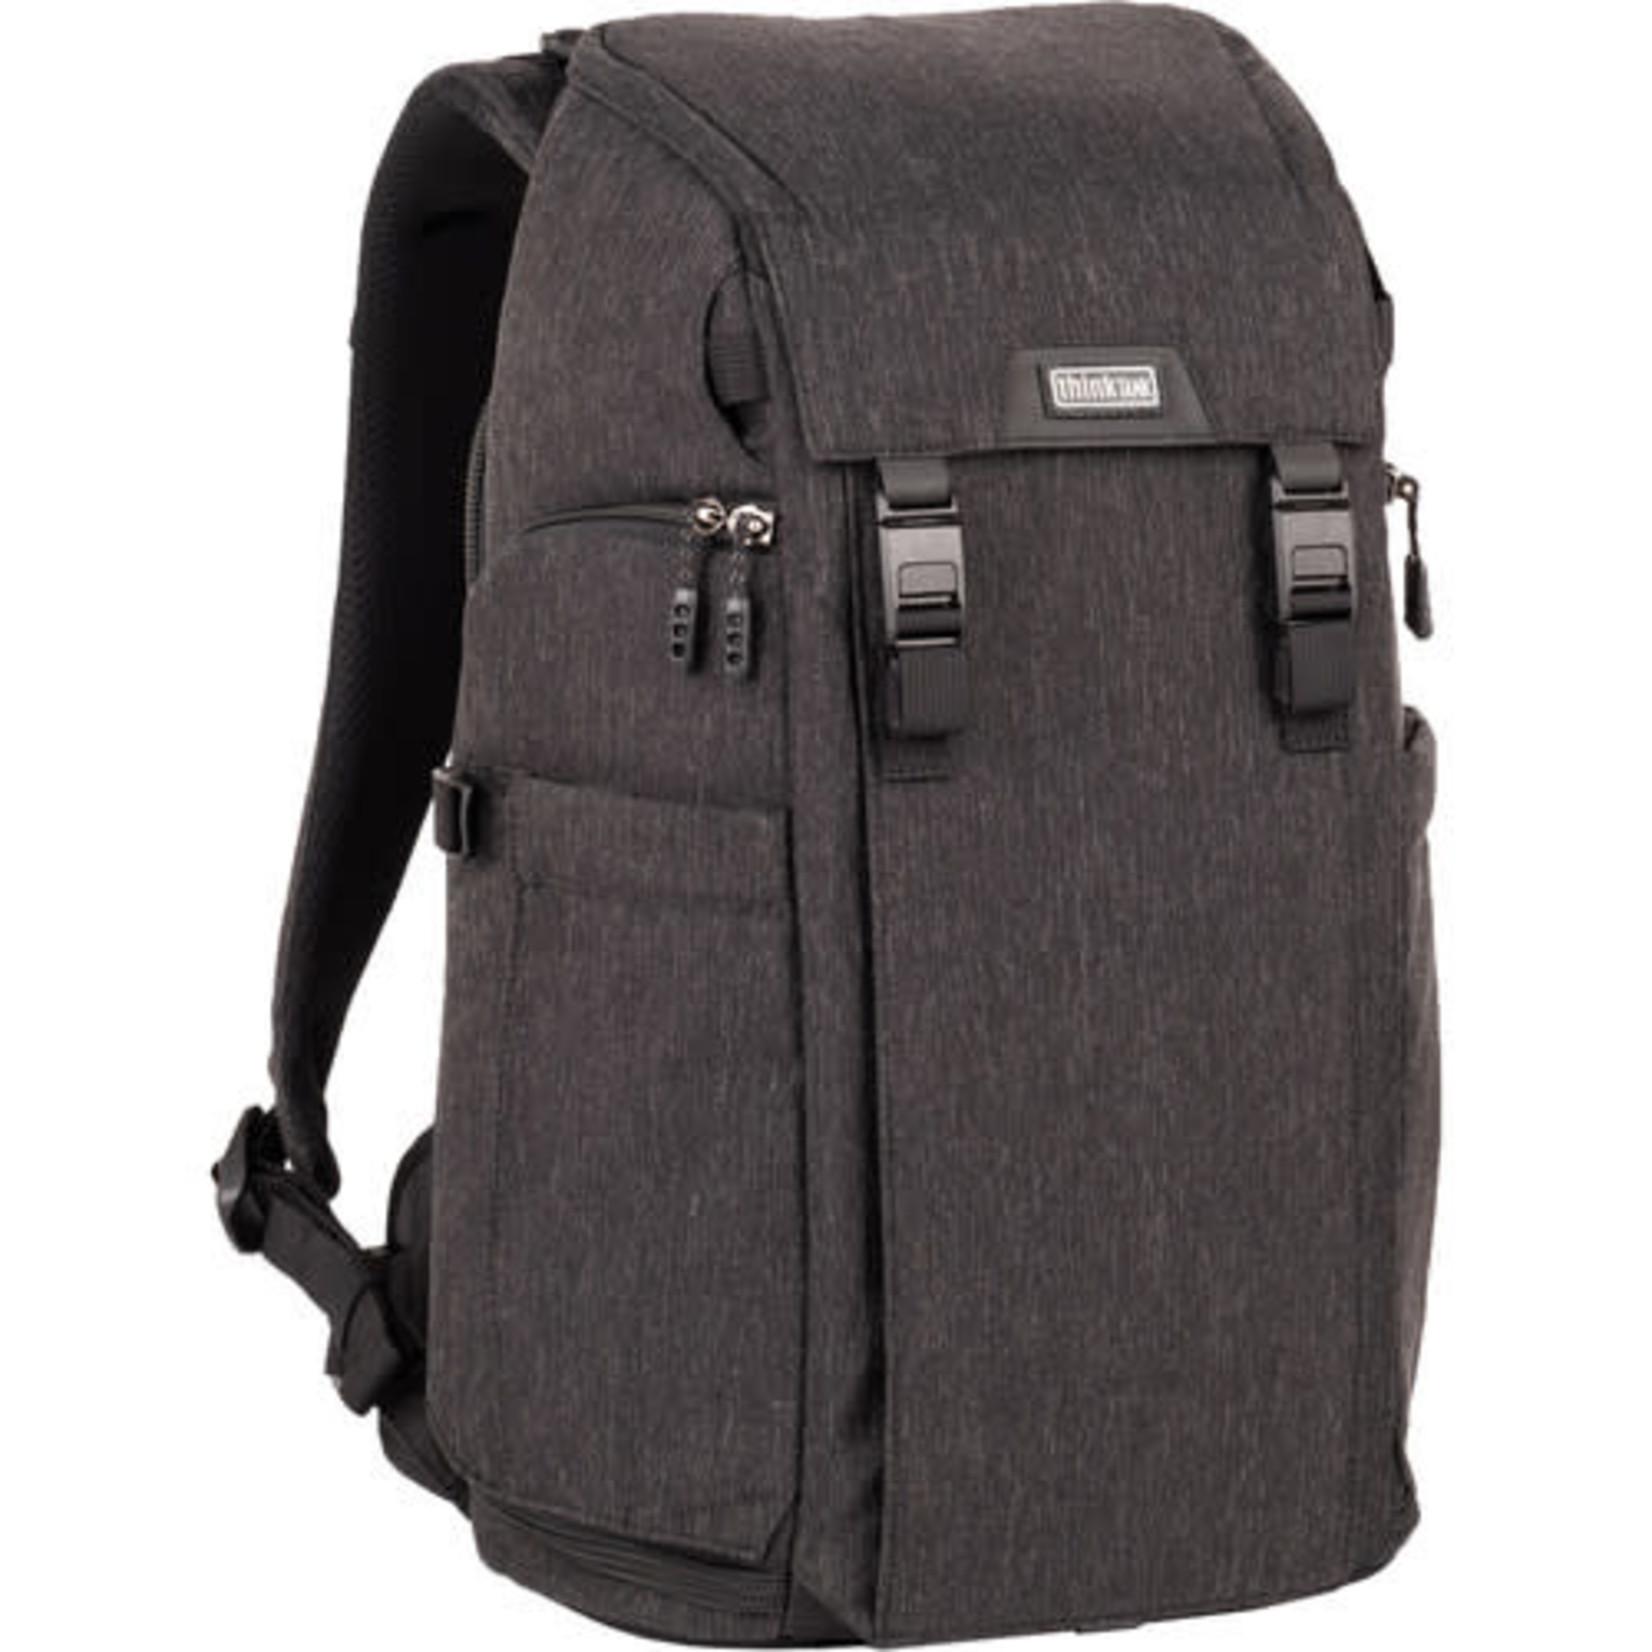 ThinkTank Urban Access Backpack 13